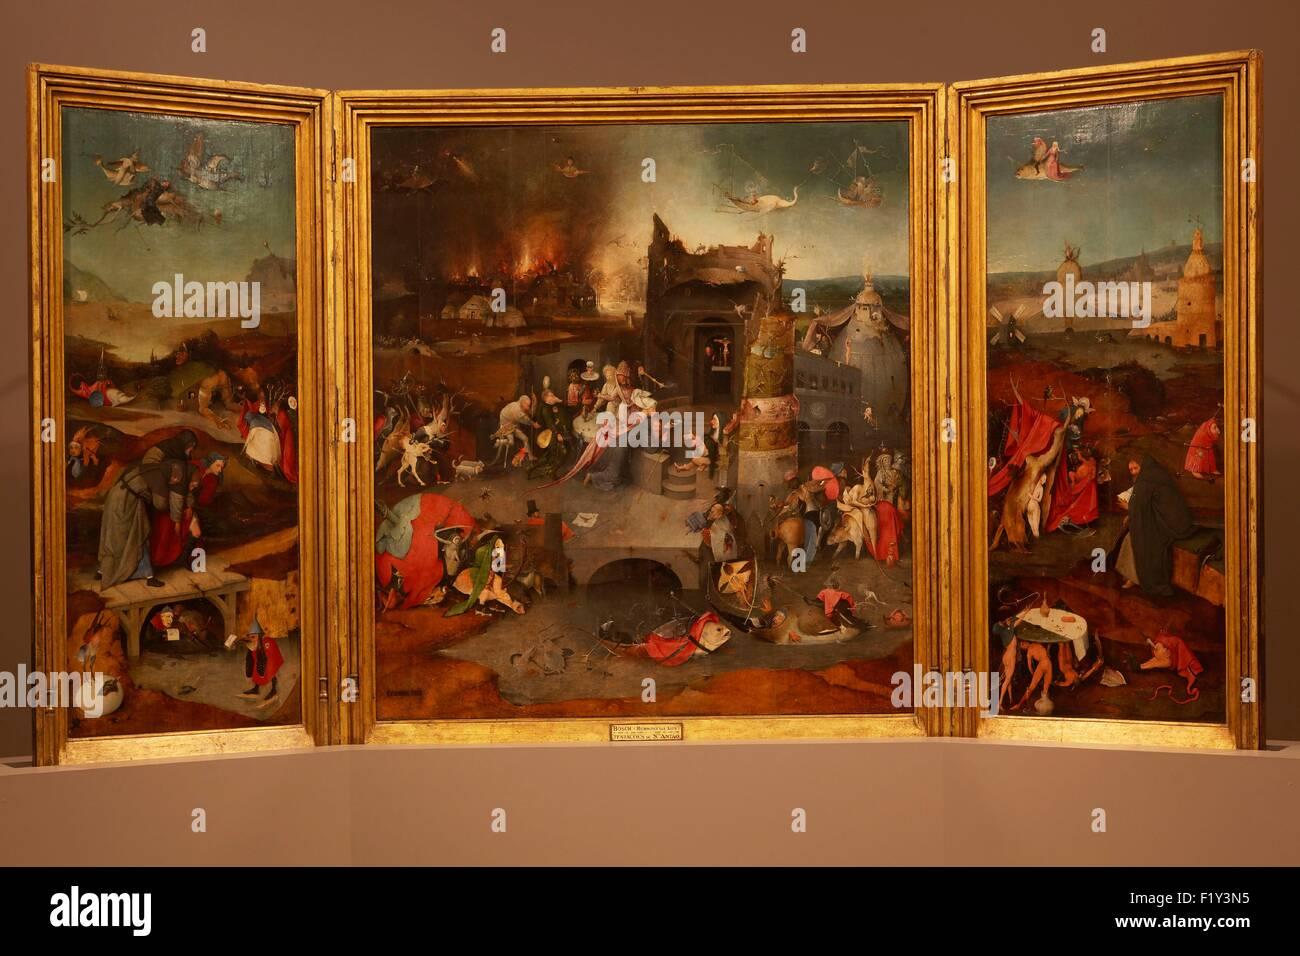 Portugal, Lisbon, Lapa, Museu National de Arte Antiga, Triptych of Temptation of St. Jerome by Hieronymus Bosch - Stock Image